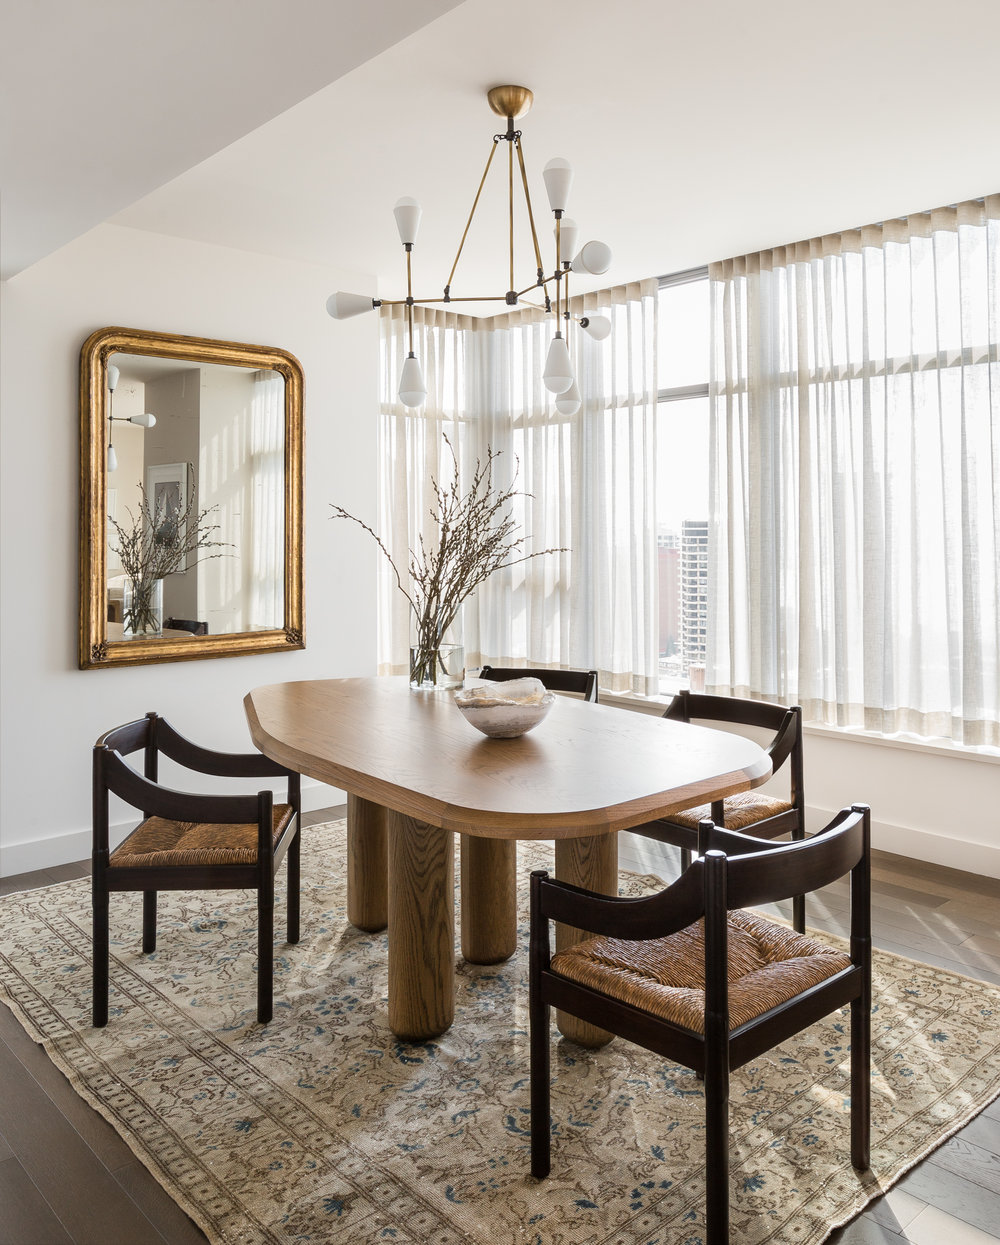 Design by  Brian Paquette Interiors